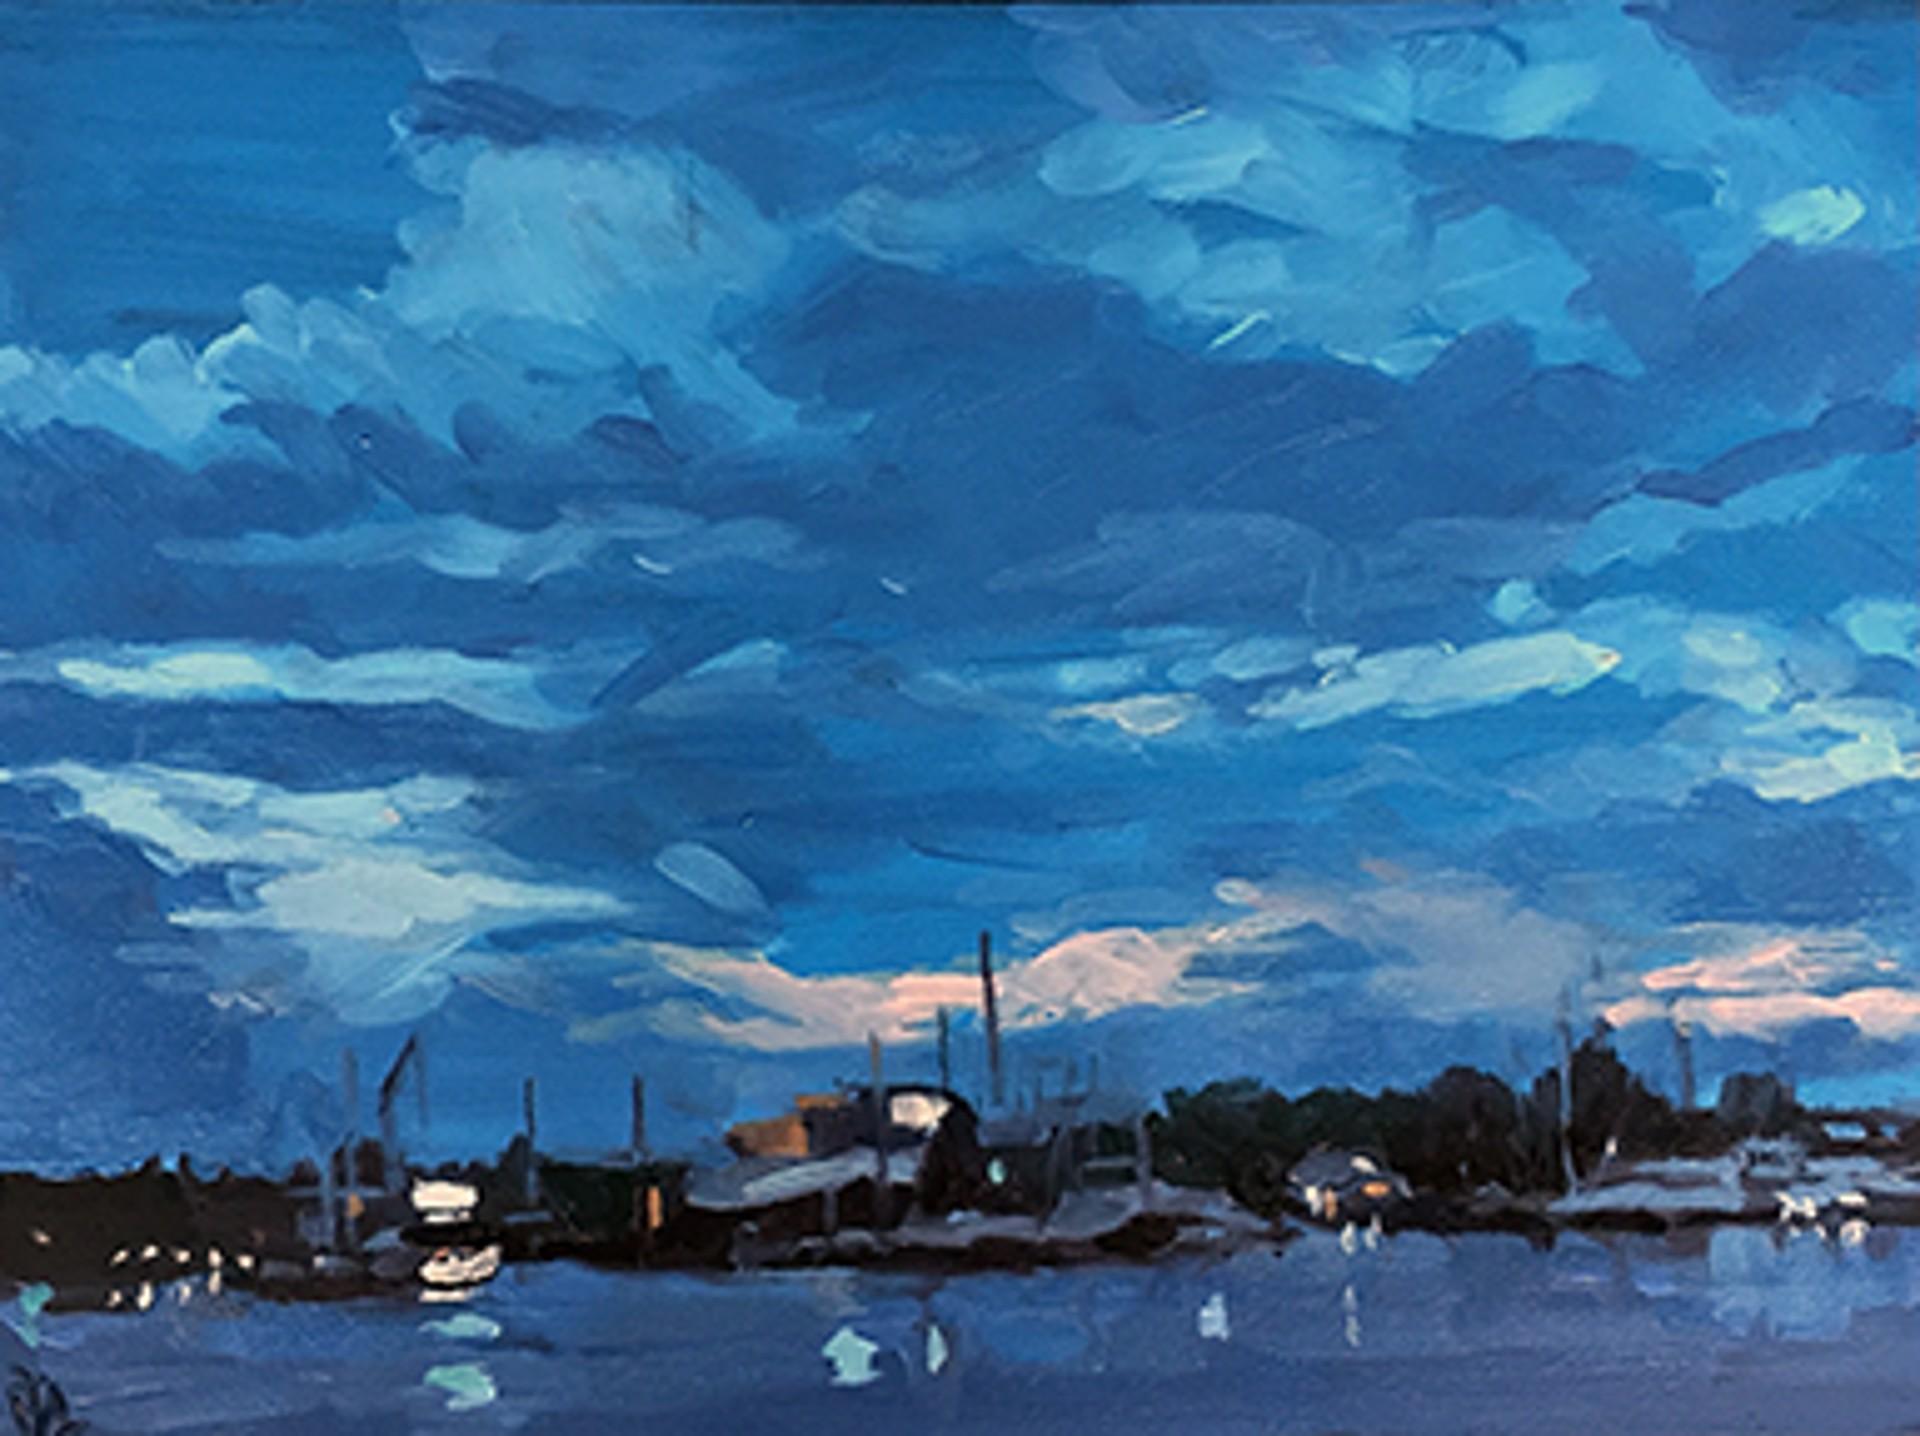 Across the Bridge by Julie Larick